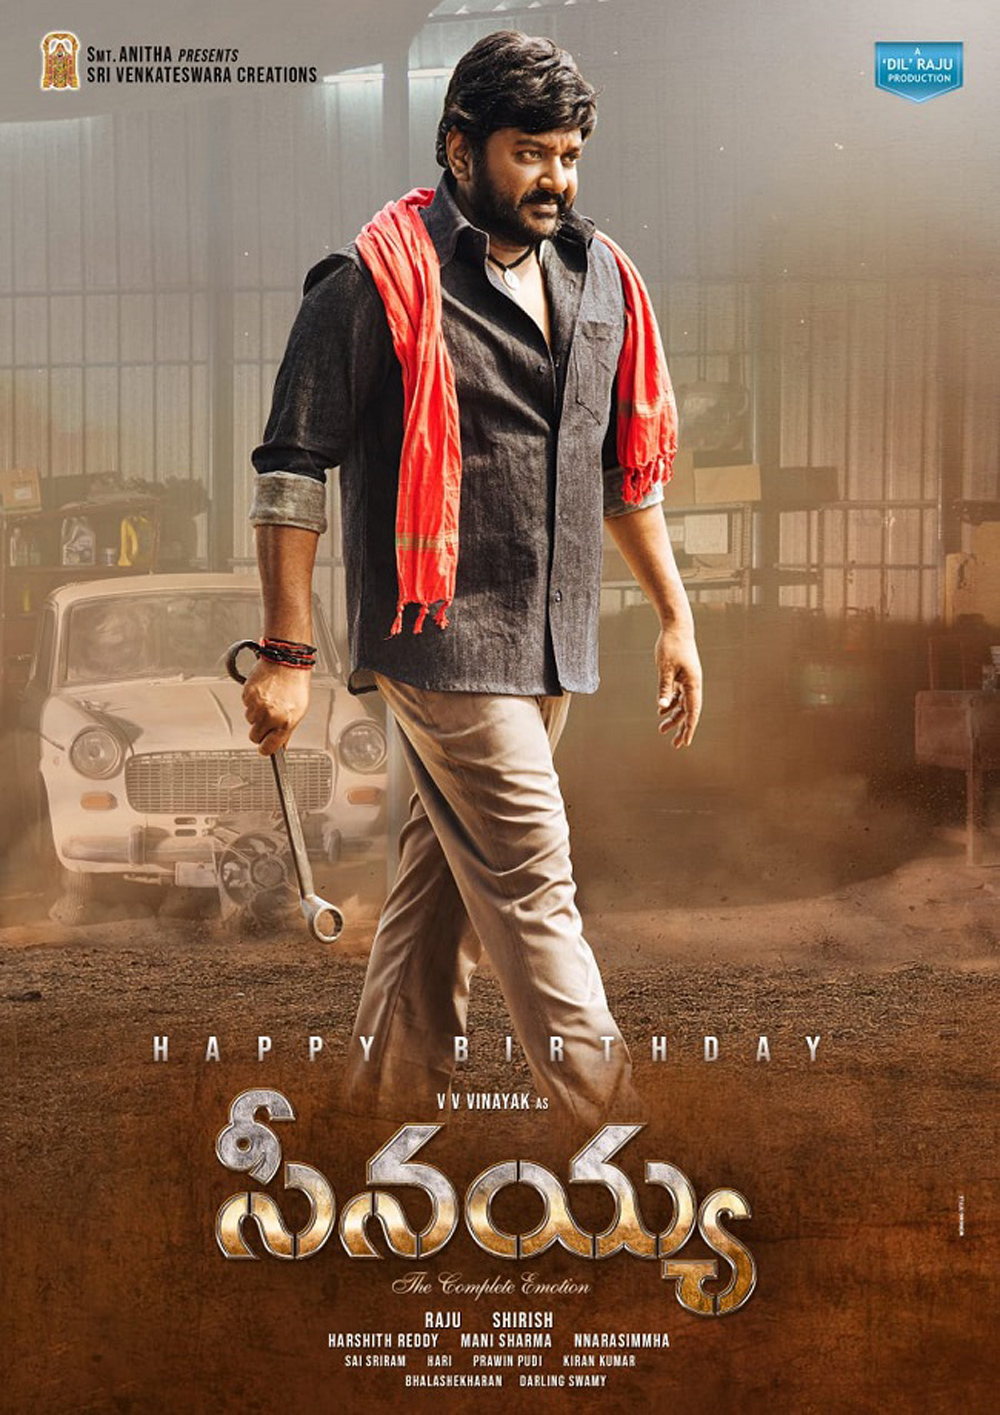 Telugu Dil Raju, Seenaiah Movie, Tollywood Box Office, Vv Vinayak, Vv Vinayak As A Hero-